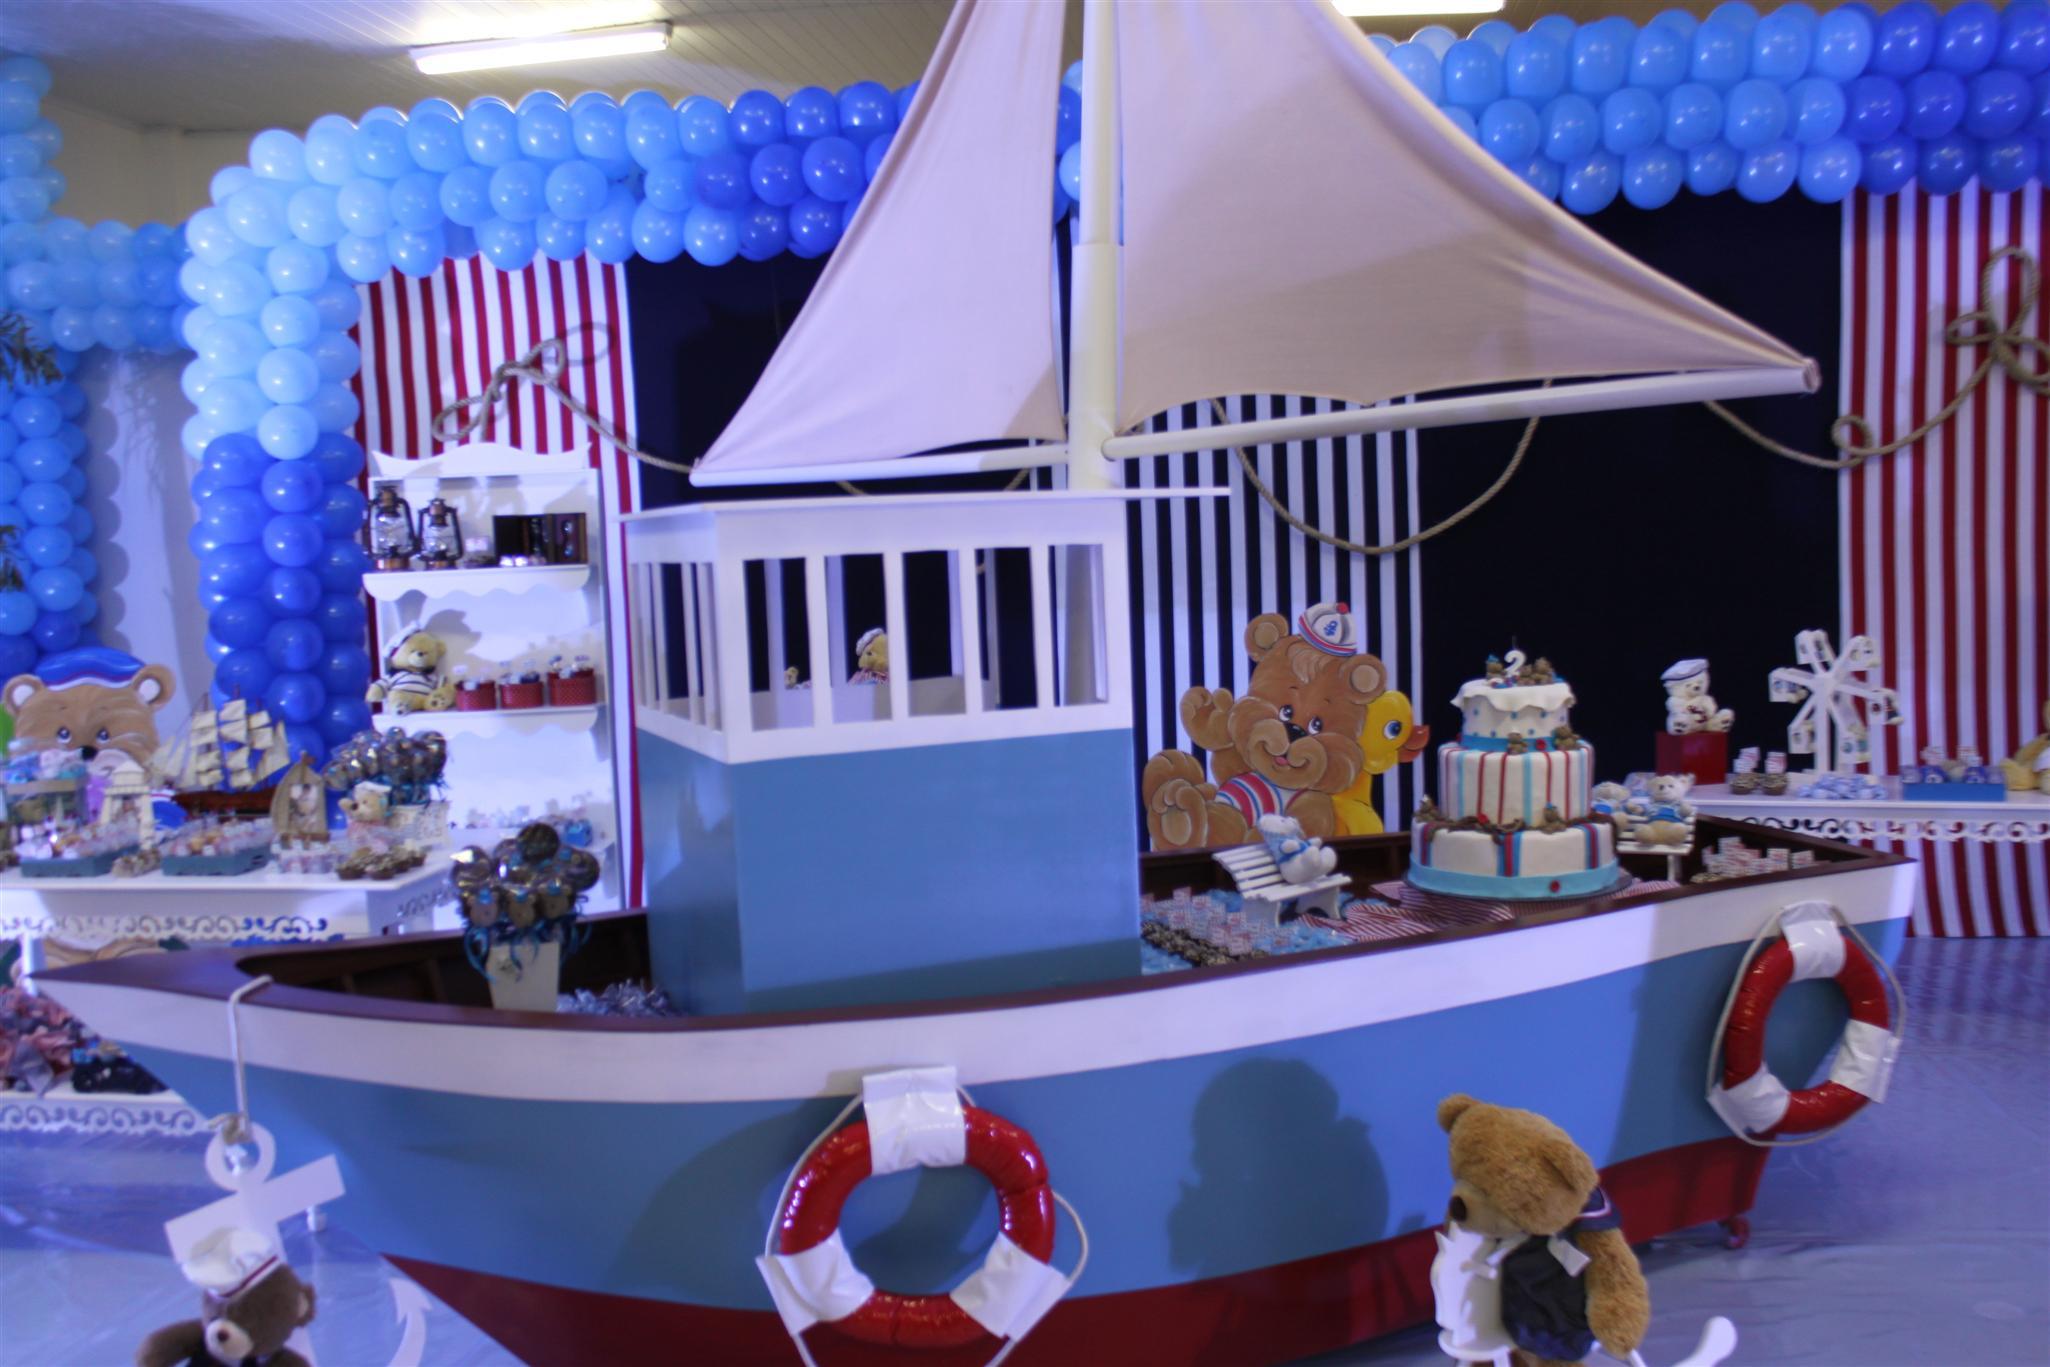 Festa tema marinheiro sarah leo festa tema marinheiro festa ursobolo urso decorao urso doces de criana thecheapjerseys Image collections